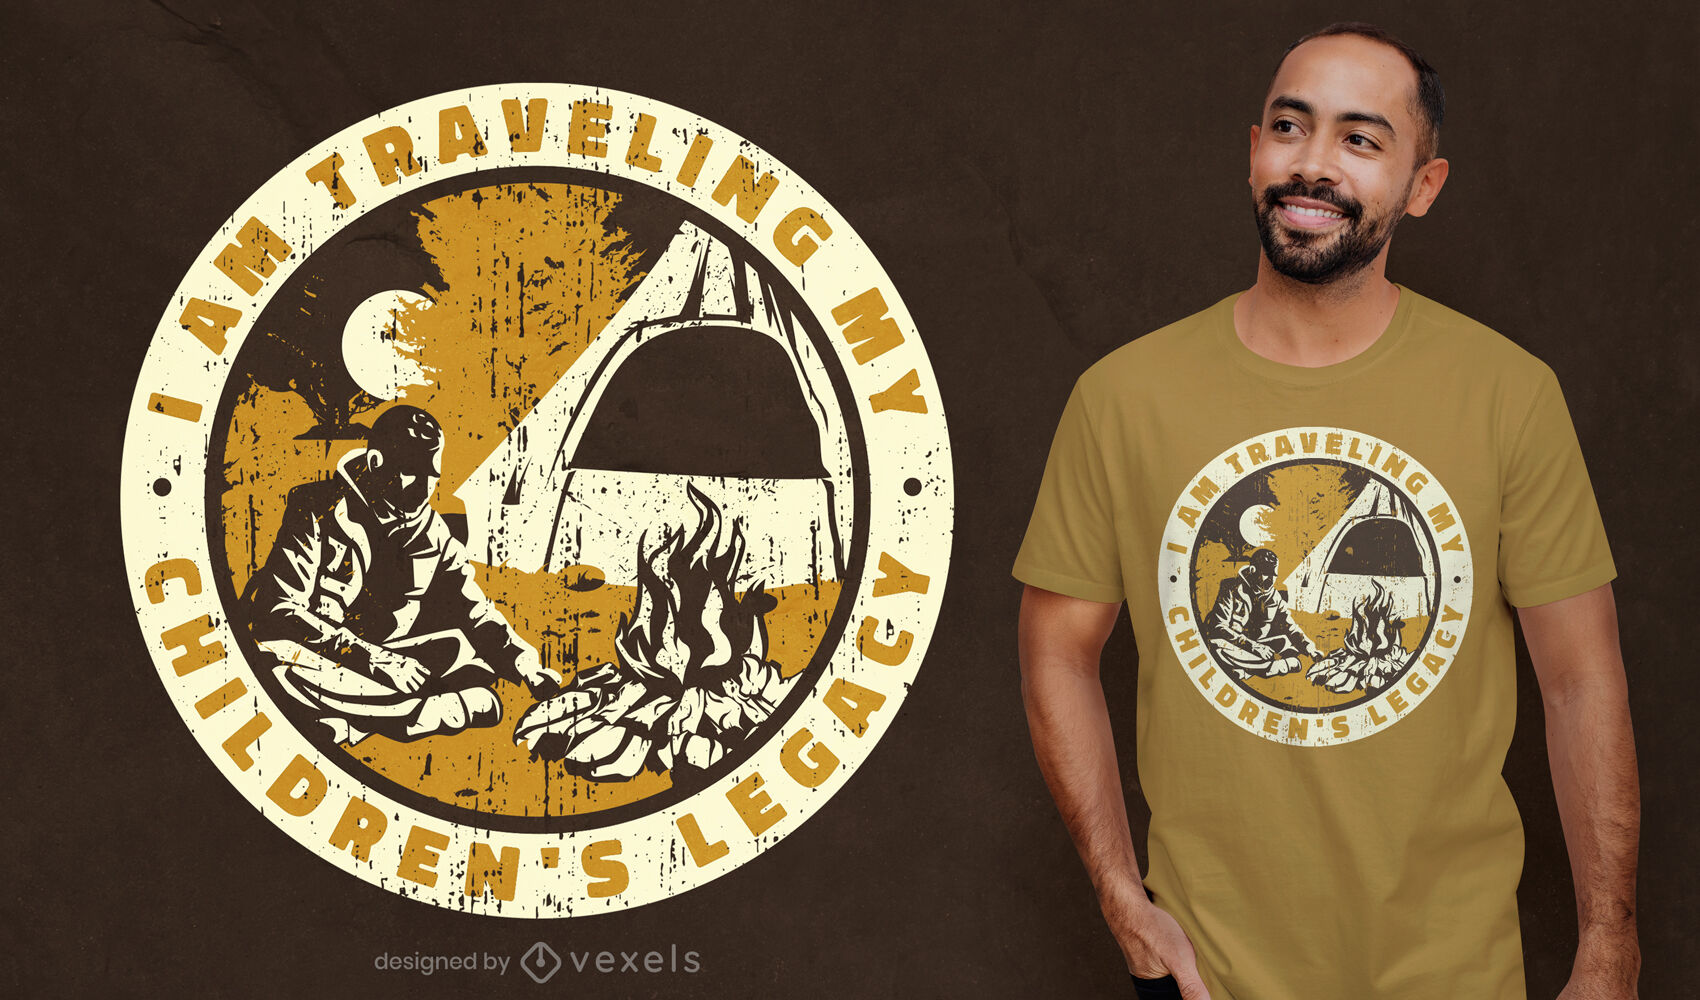 Cool camping legacy t-shirt design